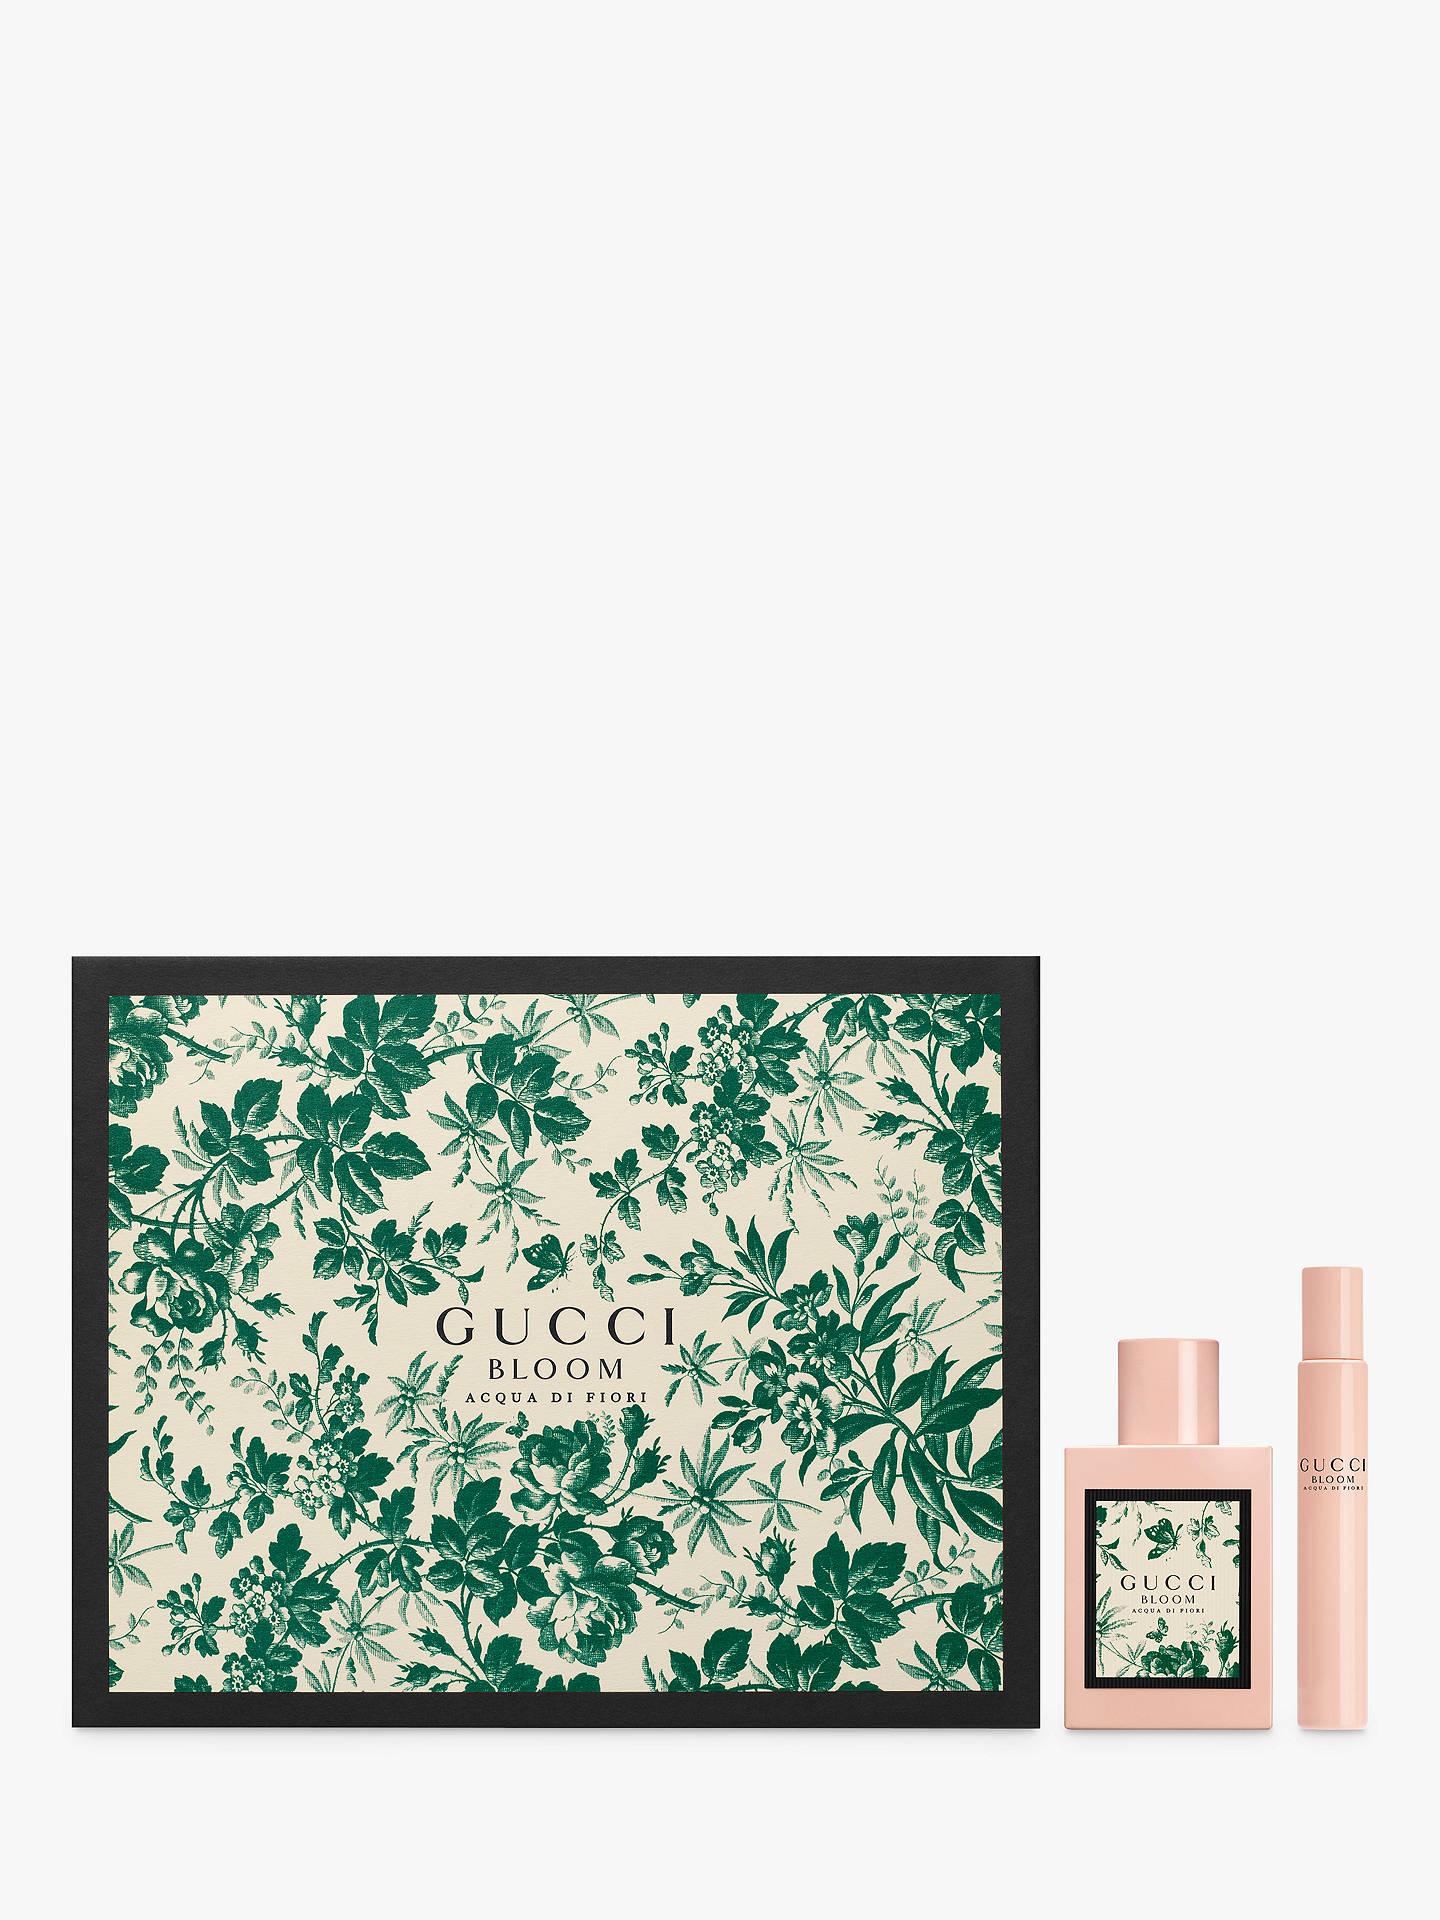 8e922376199 Buy Gucci Bloom Acqua di Fiori 50ml Eau de Toilette Fragrance Gift Set  Online at johnlewis